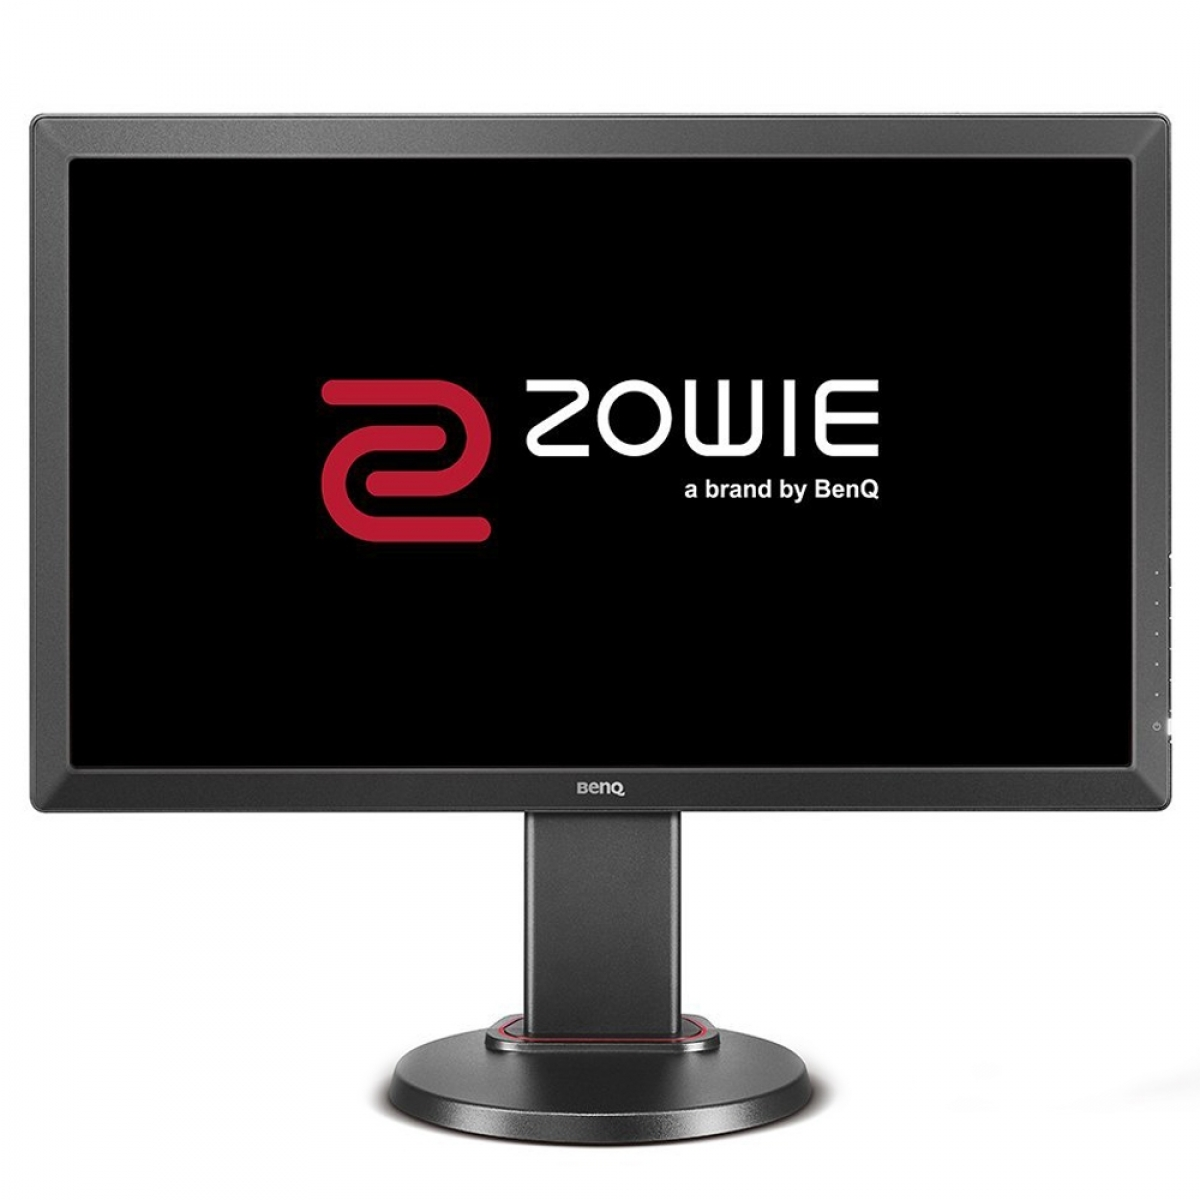 Monitor Benq Zowie 24 Pol, Full HD, 1ms, RL2460